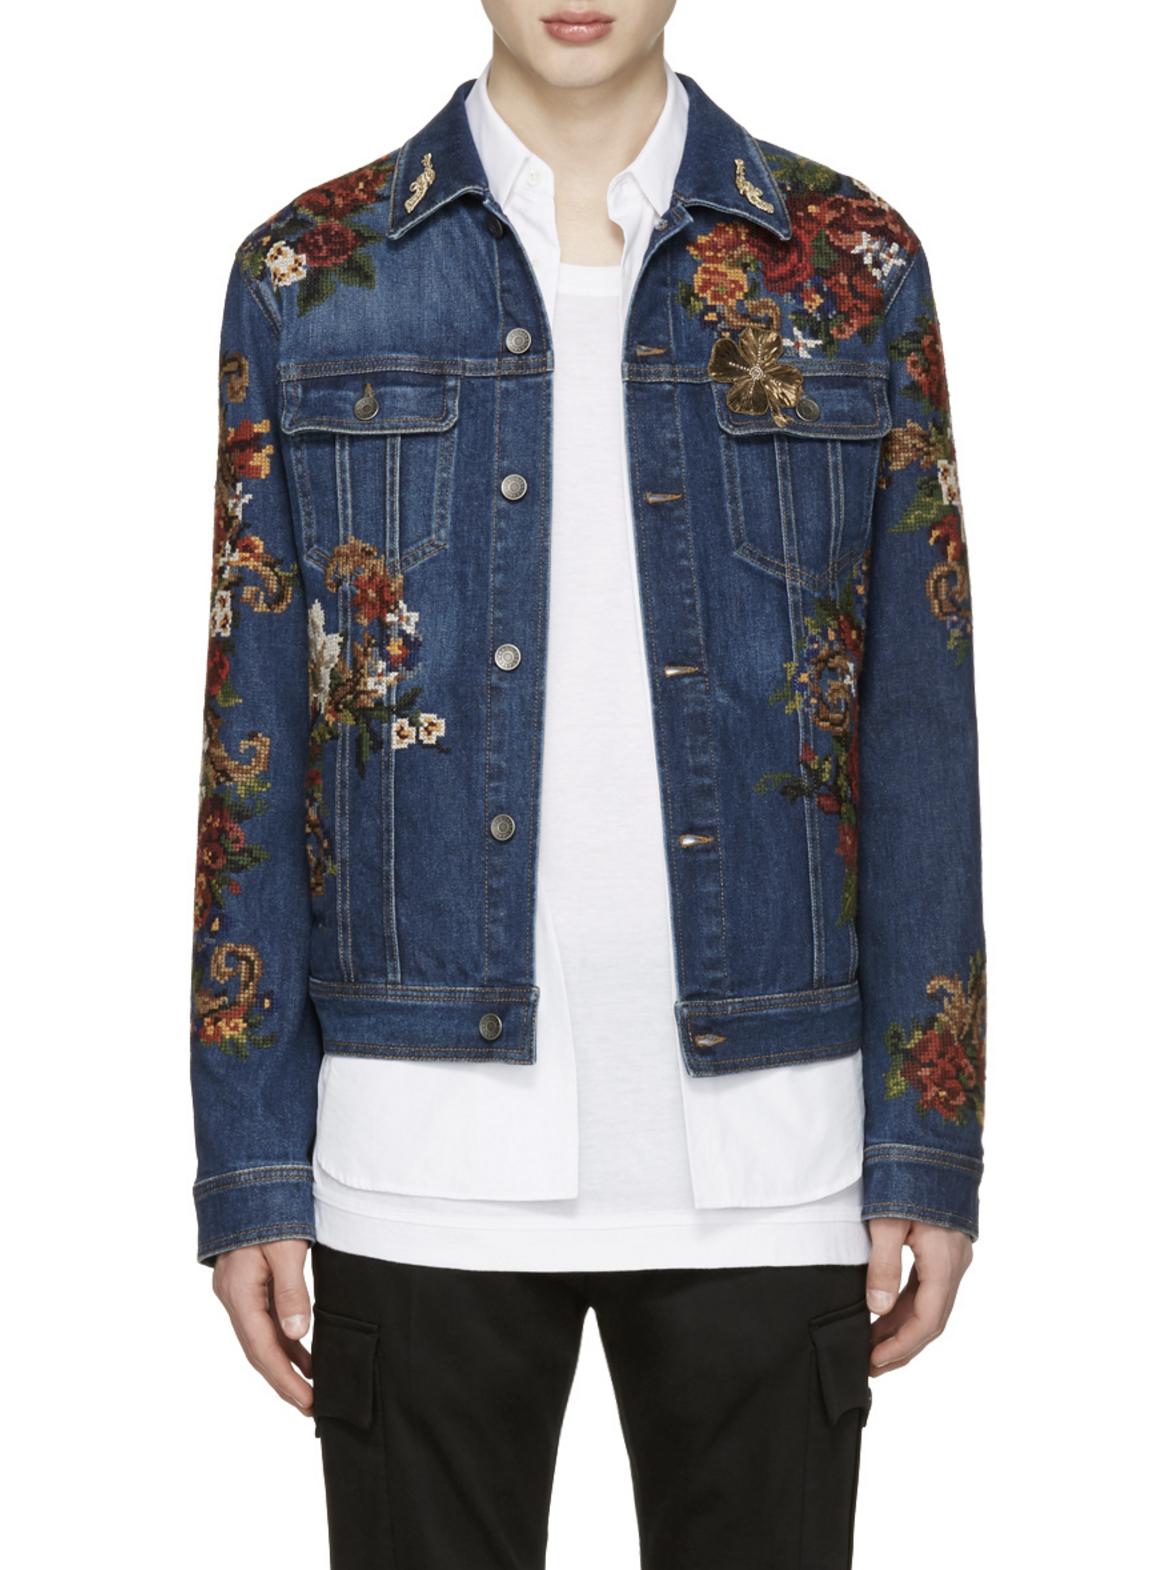 Dolce U0026 Gabbana Embroidered Denim Jacket From SSENSE (men Style Fashion Clothing Shopping ...